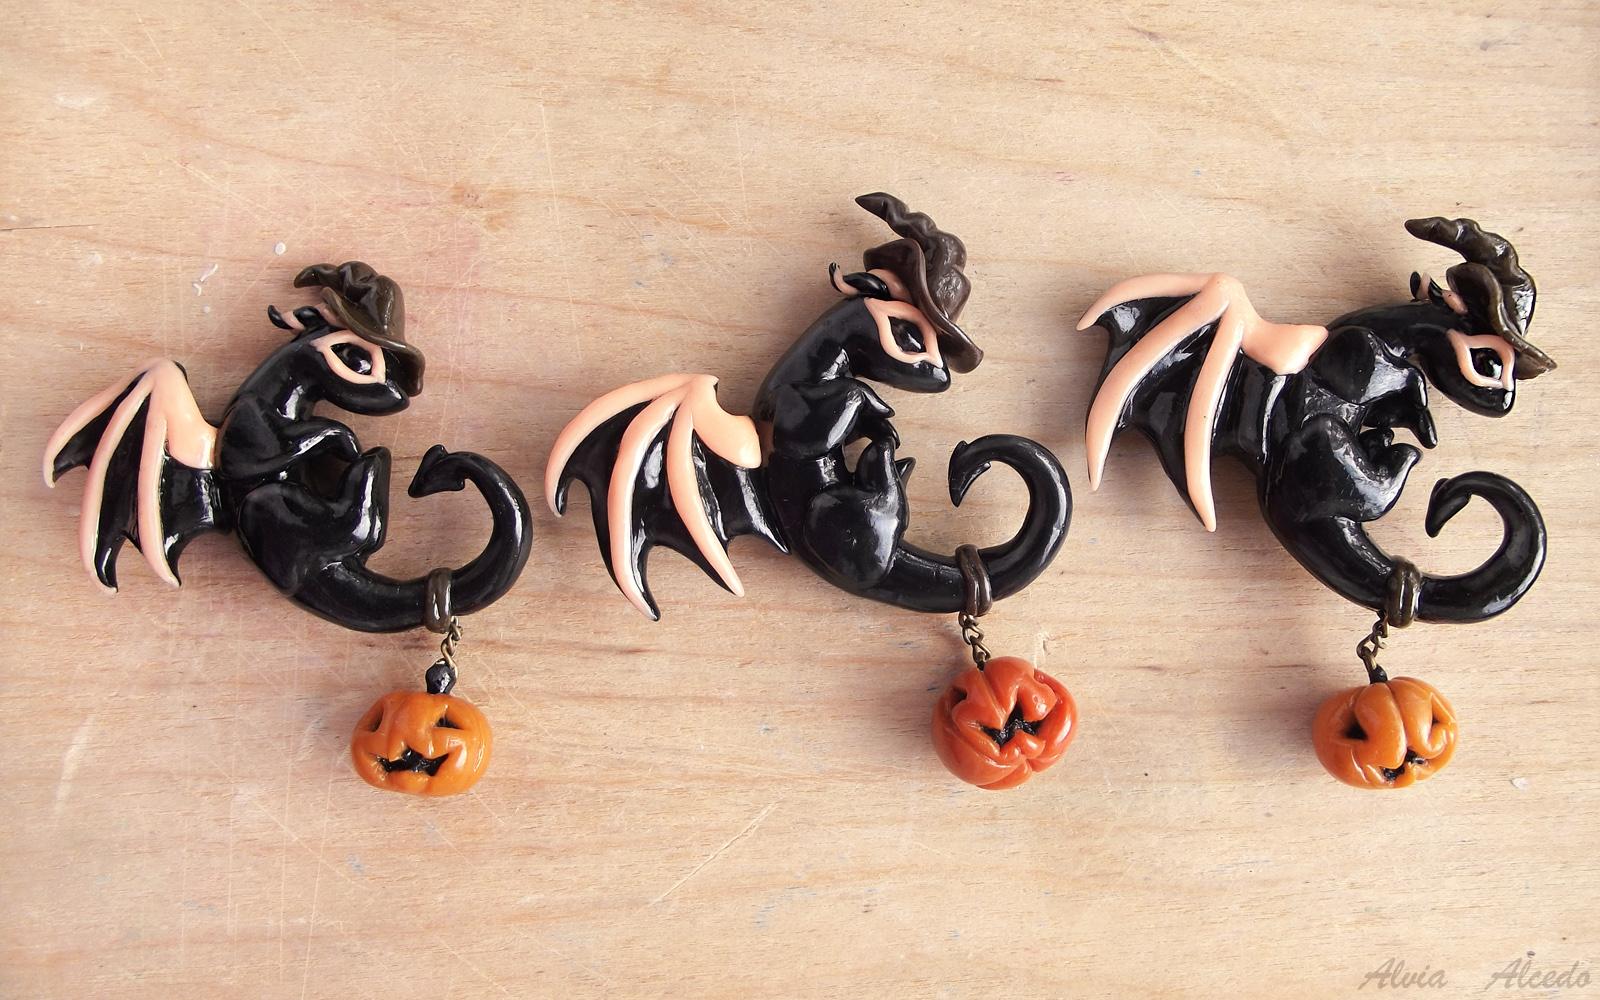 Halloween dragons trio by AlviaAlcedo